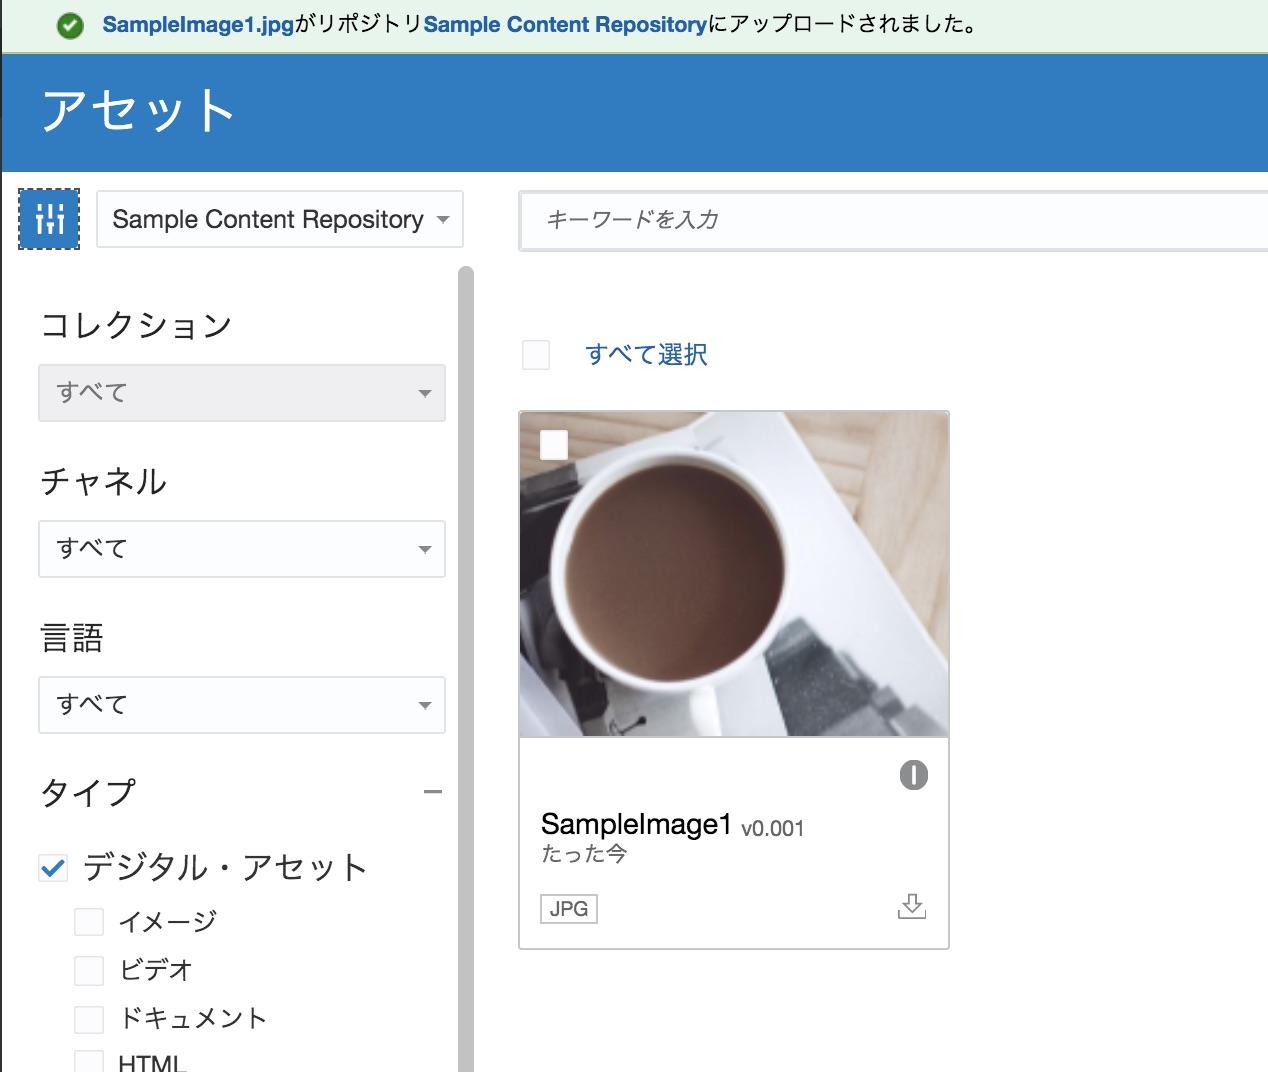 image_oce29.jpg